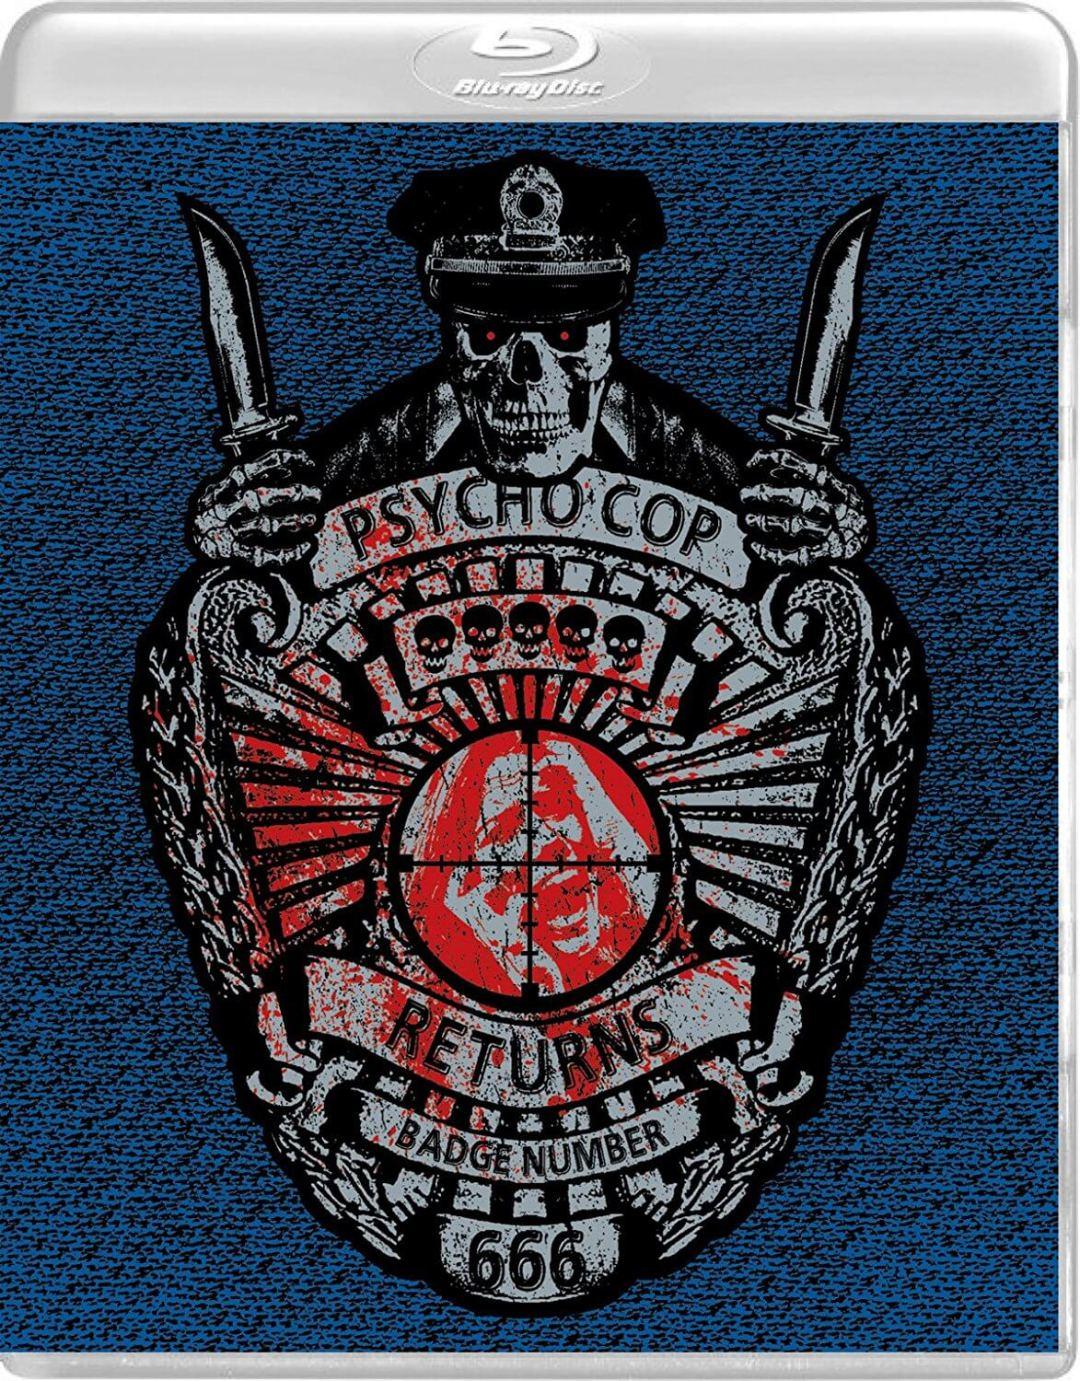 Vinegar Syndrome Is Calling Up 'Psycho Cop' To Deliver Some Brutal Justice!